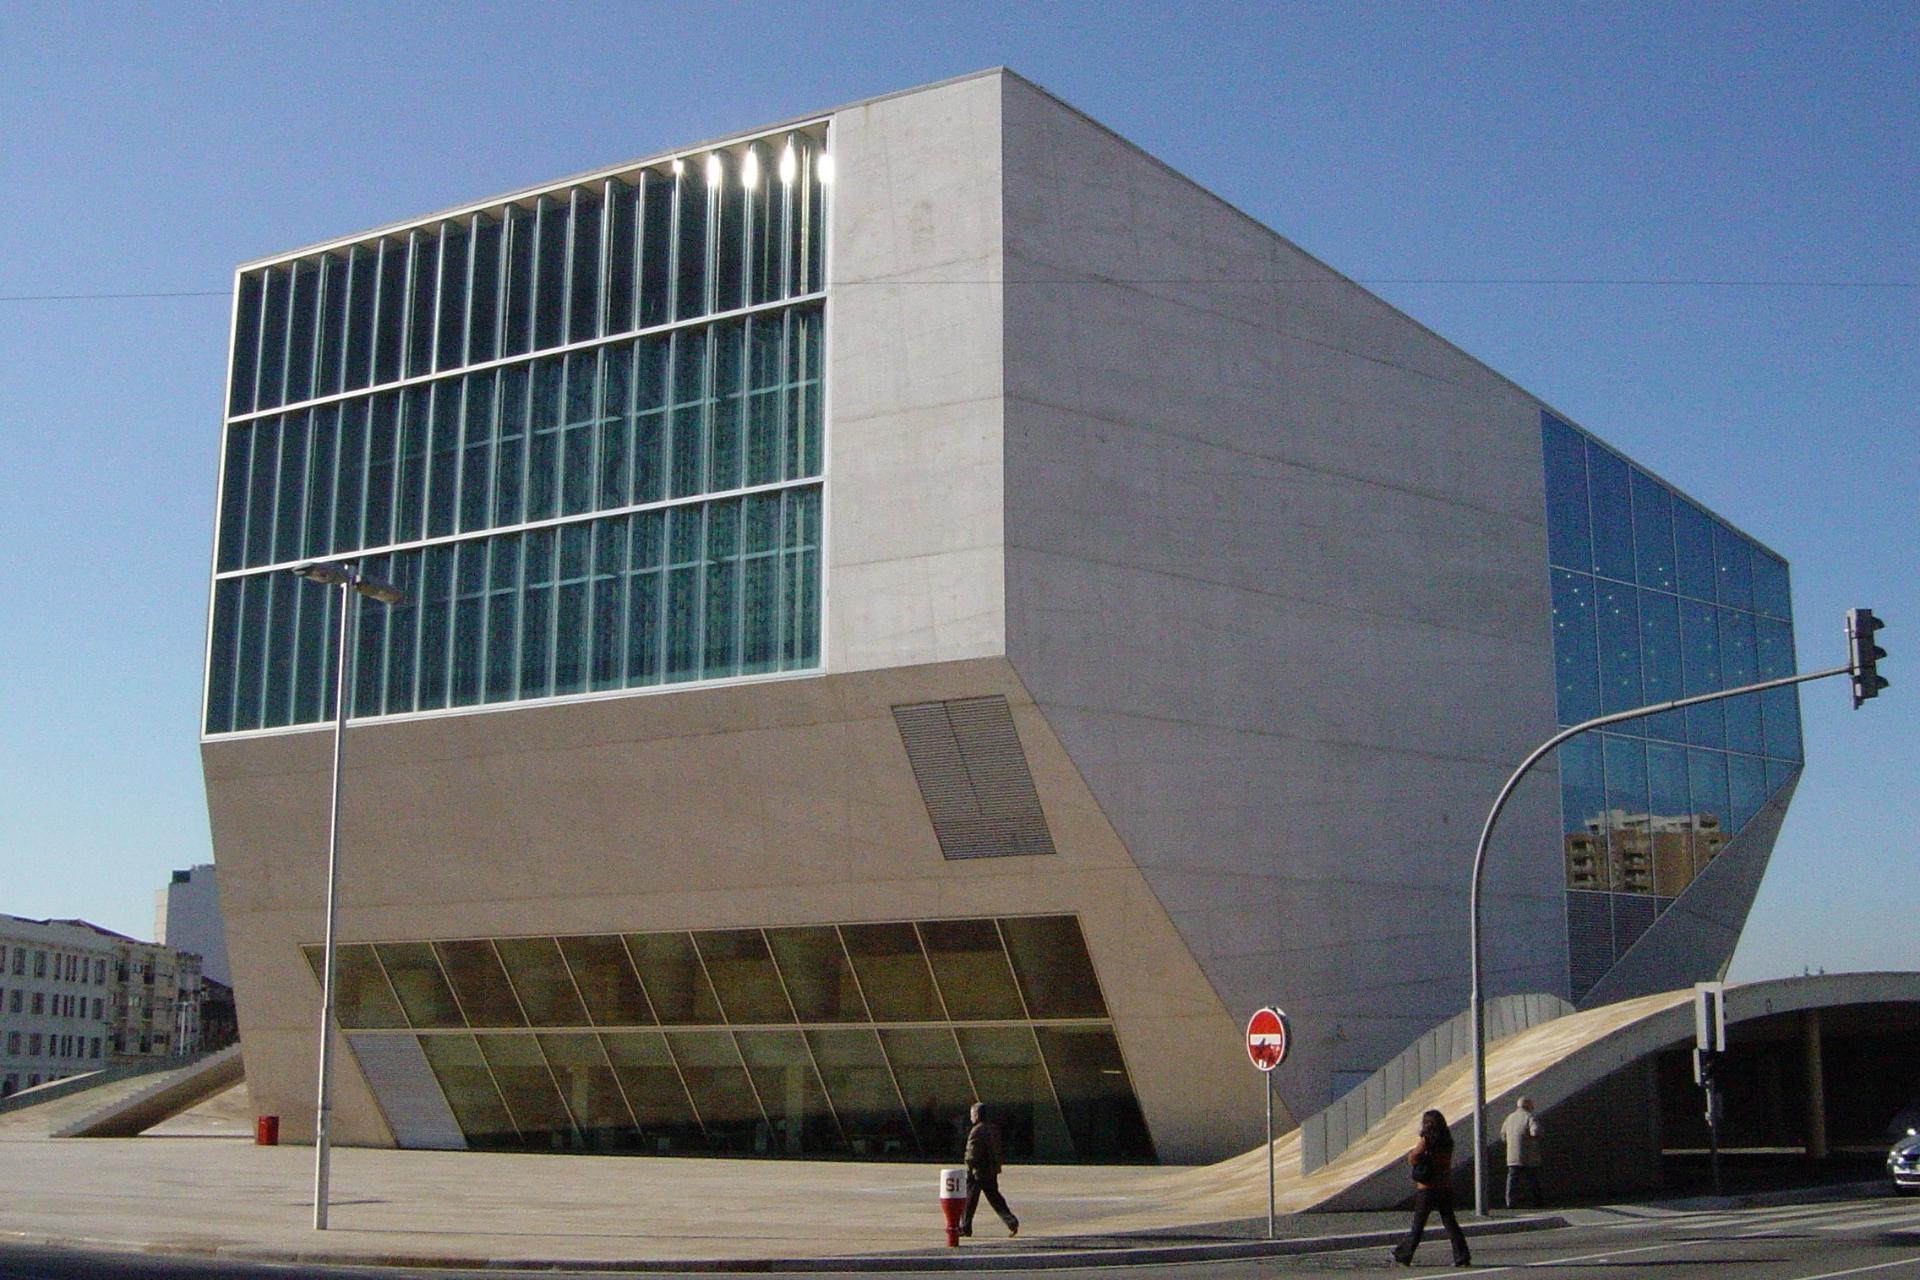 Casa da m sica max frank for Piscitelli casa de musica